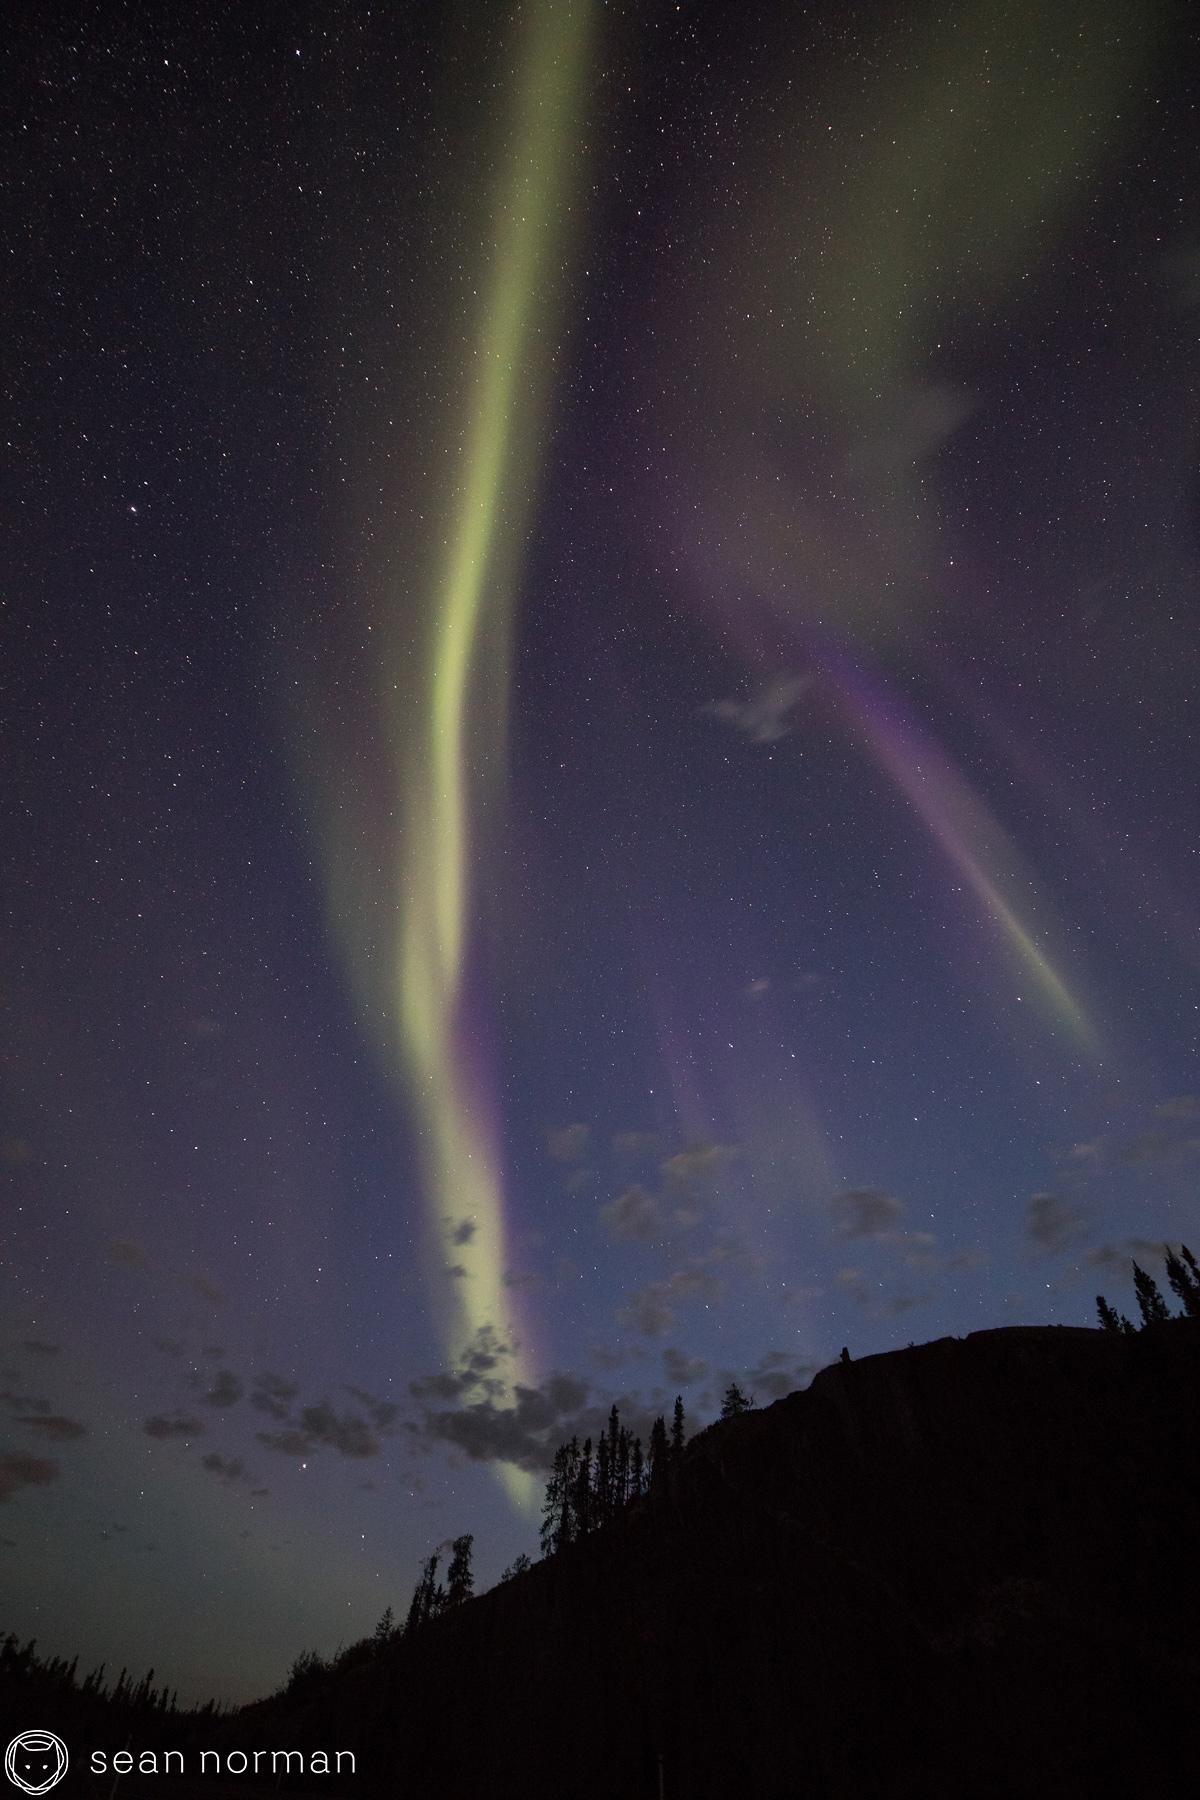 Autumn Auora Viewing in Yellowknife - Sean Norman Aurora Chaser - 2.jpg